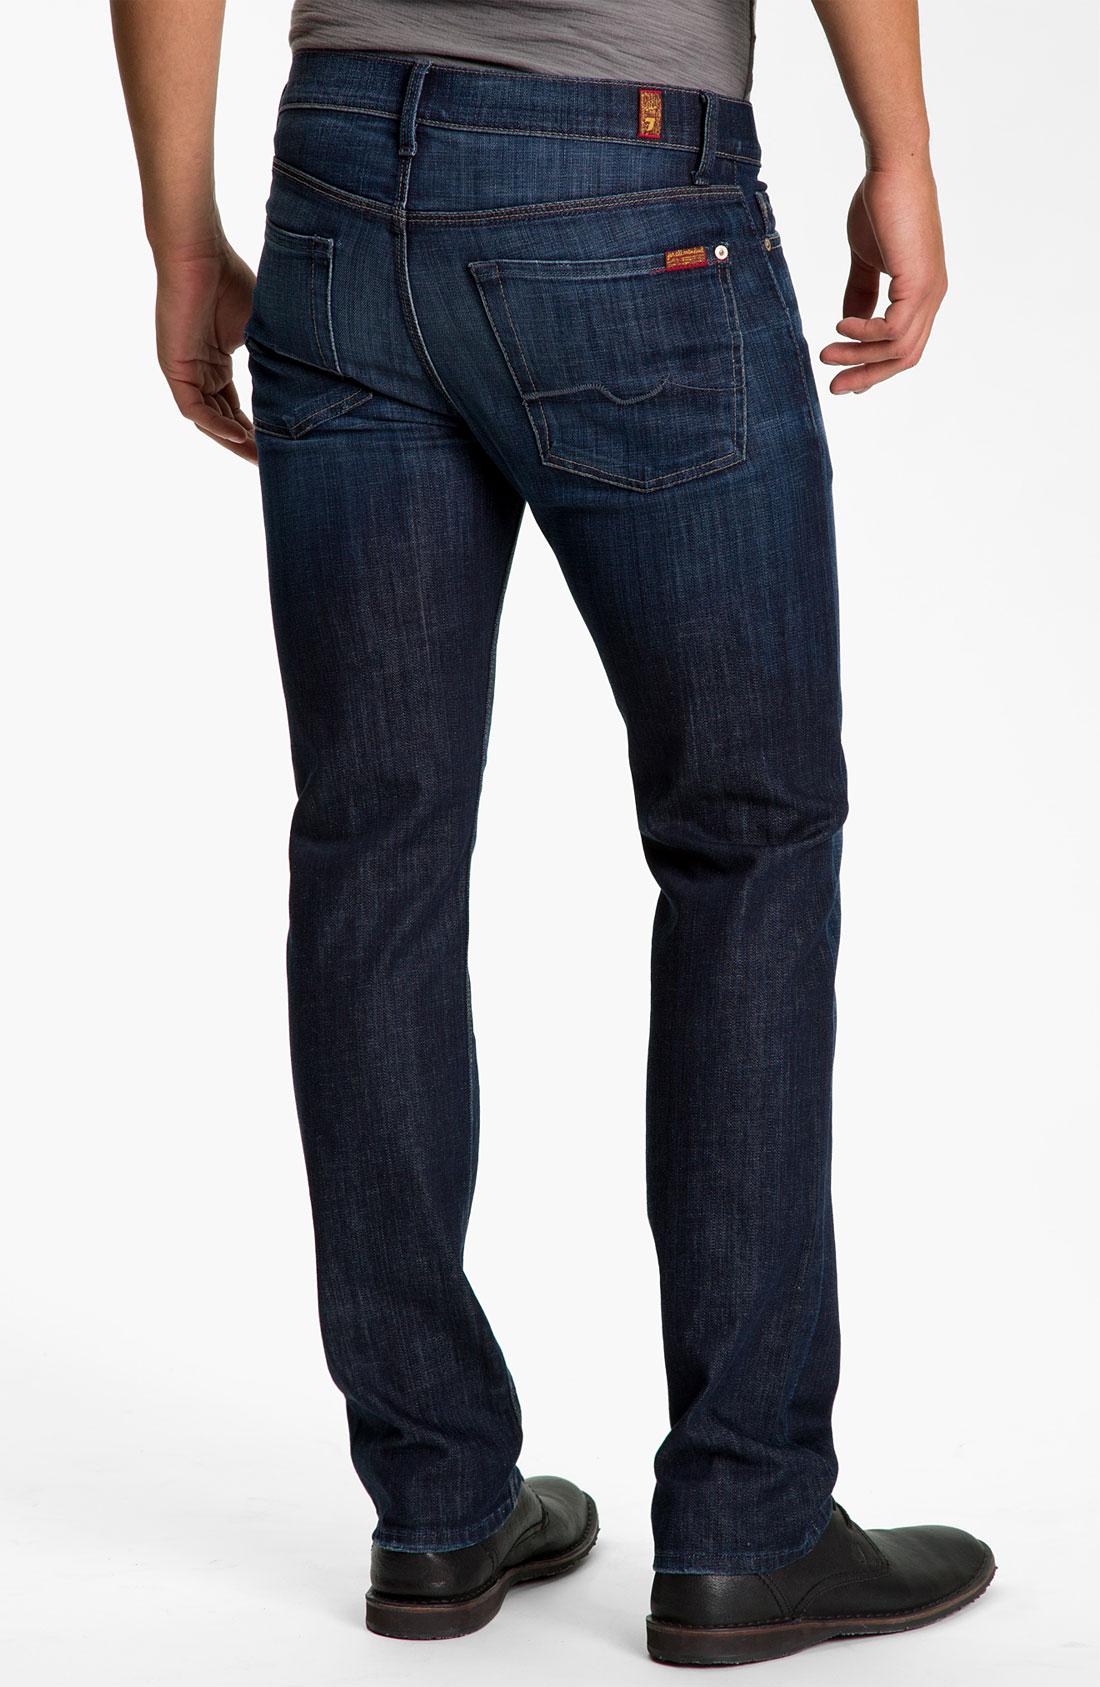 7 for all mankind 39 slimmy 39 slim straight leg jeans in blue for men los angeles dark lyst. Black Bedroom Furniture Sets. Home Design Ideas